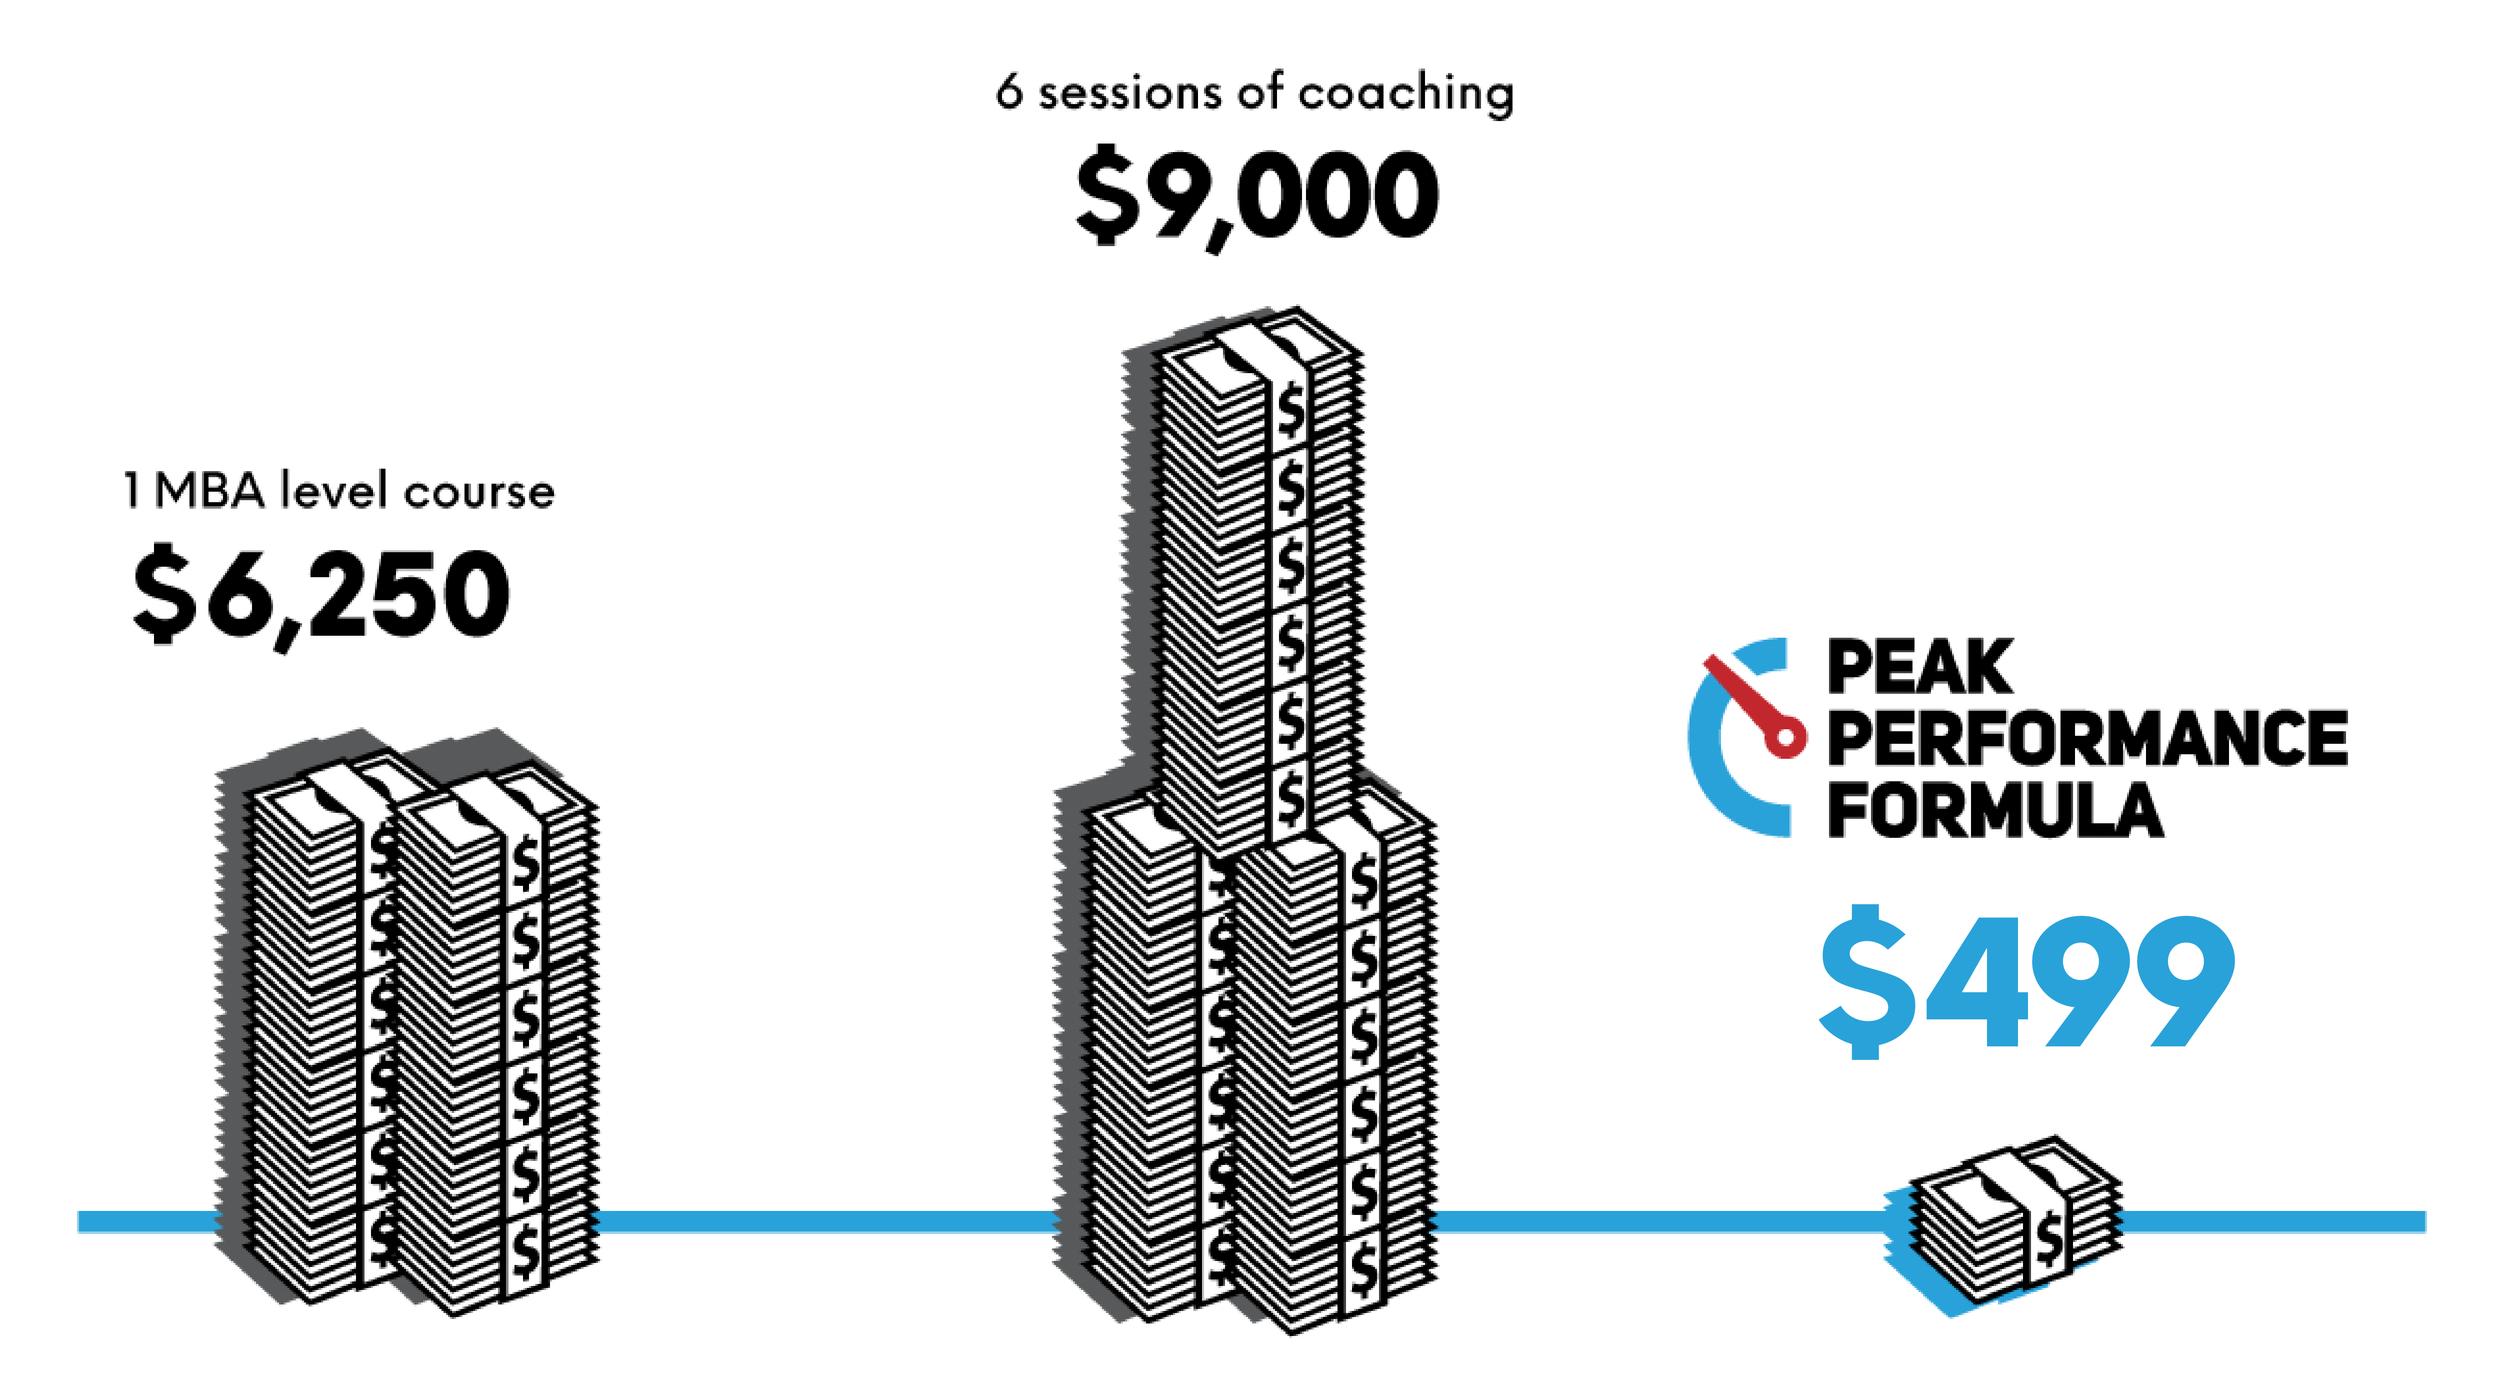 peak_performance_formula.png